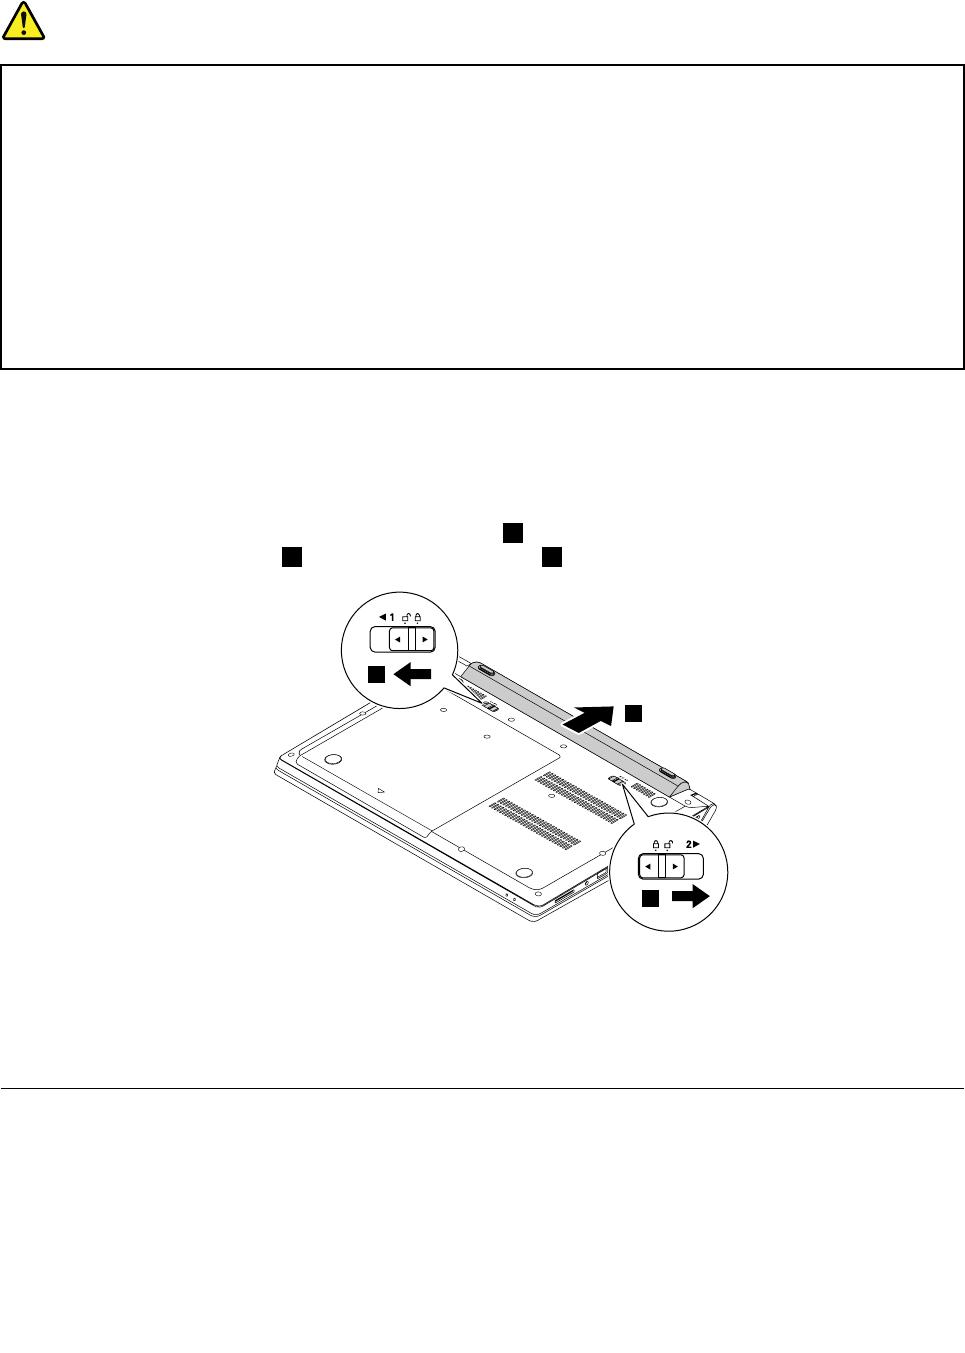 Lenovo M490S Ug Es User Manual Guide Laptop (Lenovo) Type